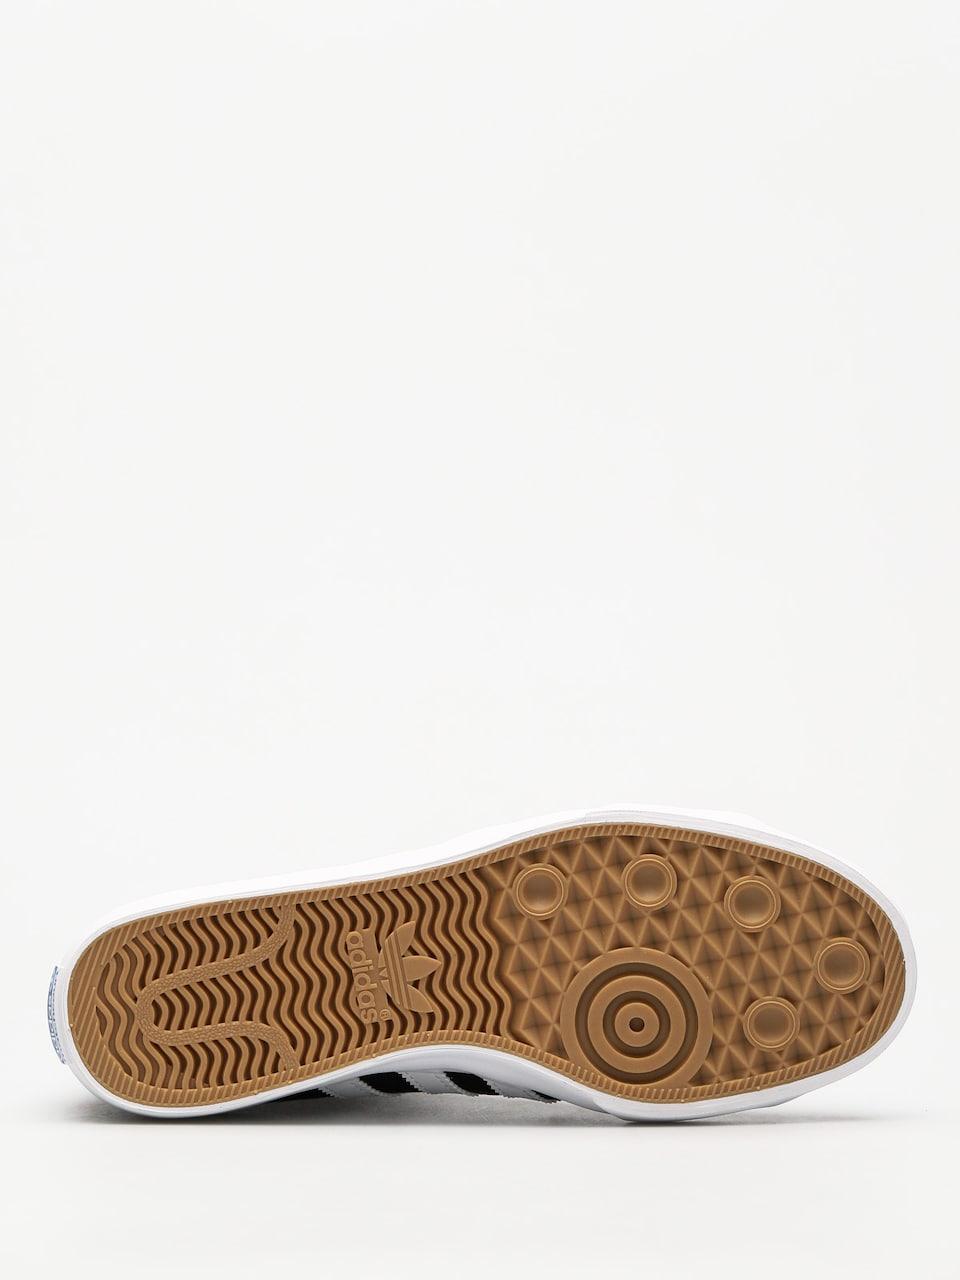 Buty adidas Matchcourt High Rx (core blackftwr whitegum4)